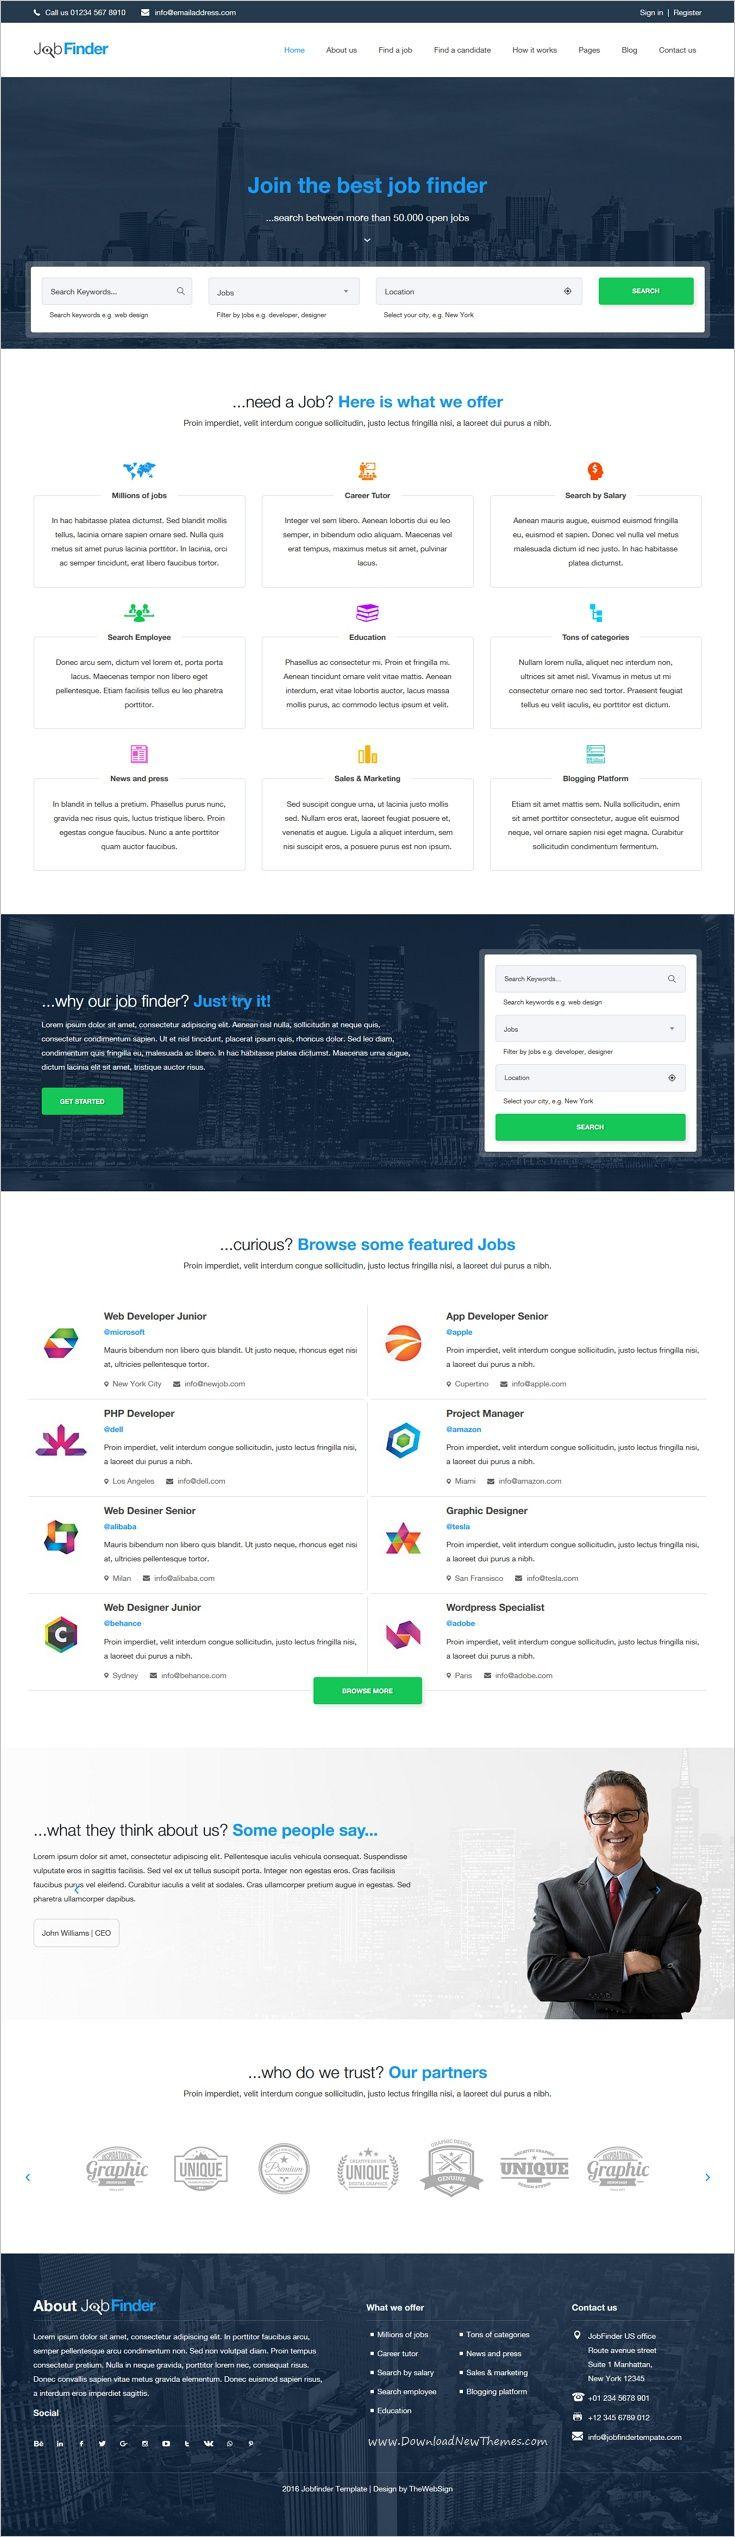 The mentor network employee portal - Jobfinder Job Portal Html5 Template